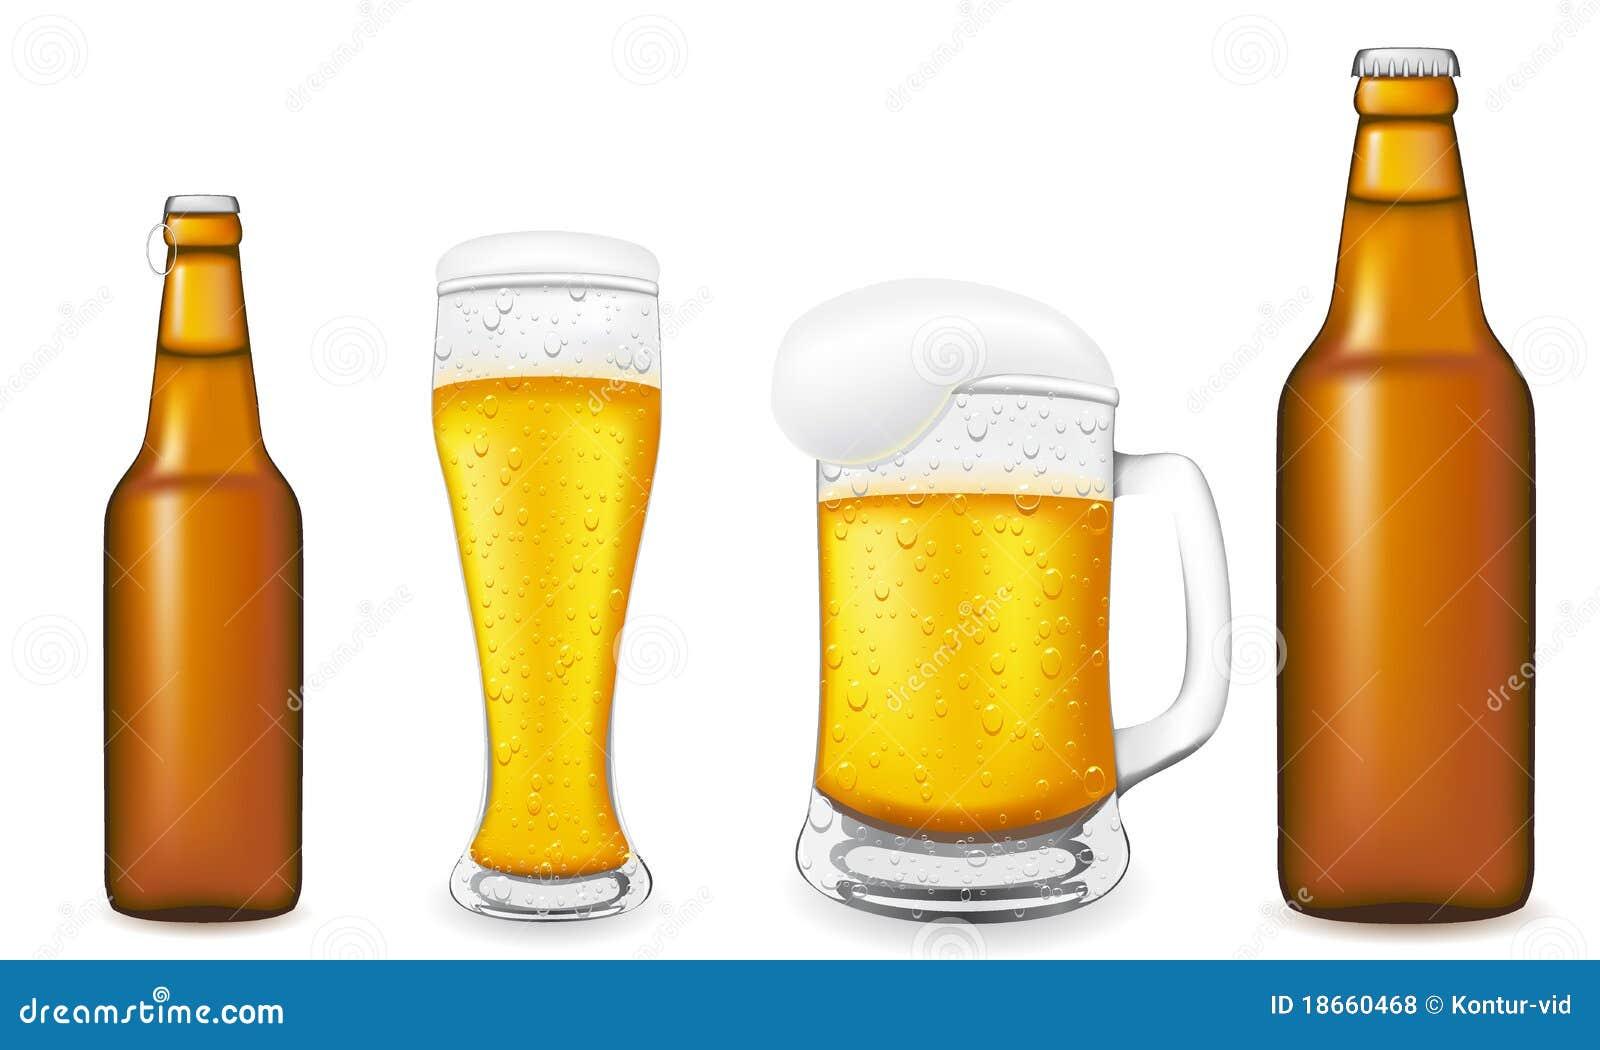 Botella De Cerveza Dibujo: Beer Bottle Vector